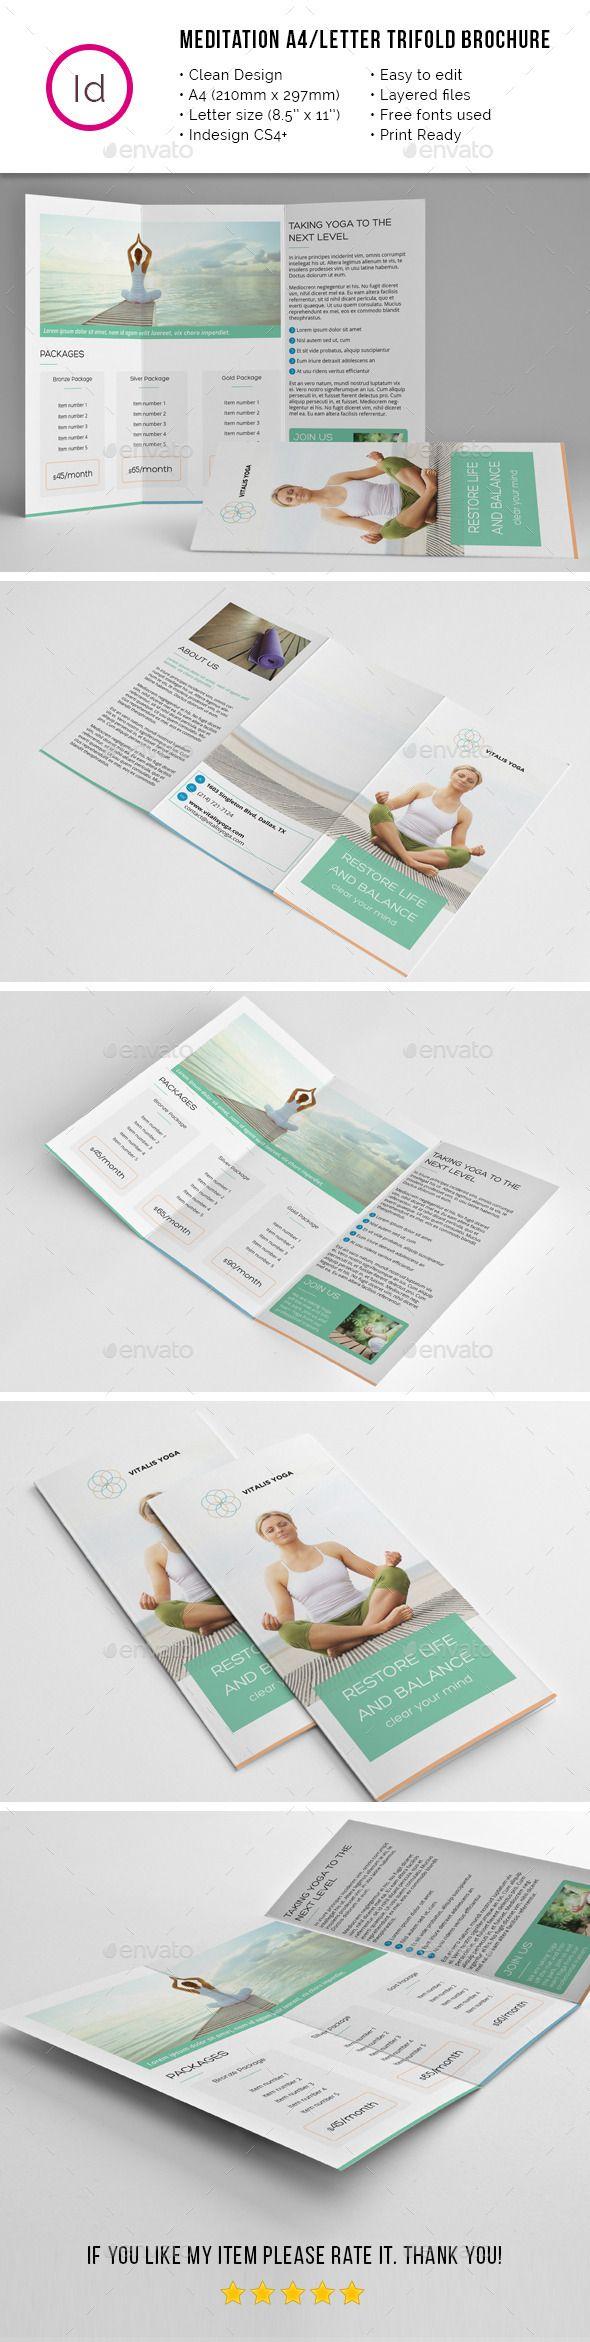 Yoga Meditation A4 / Letter Trifold Brochure | Pinterest | Leporello ...